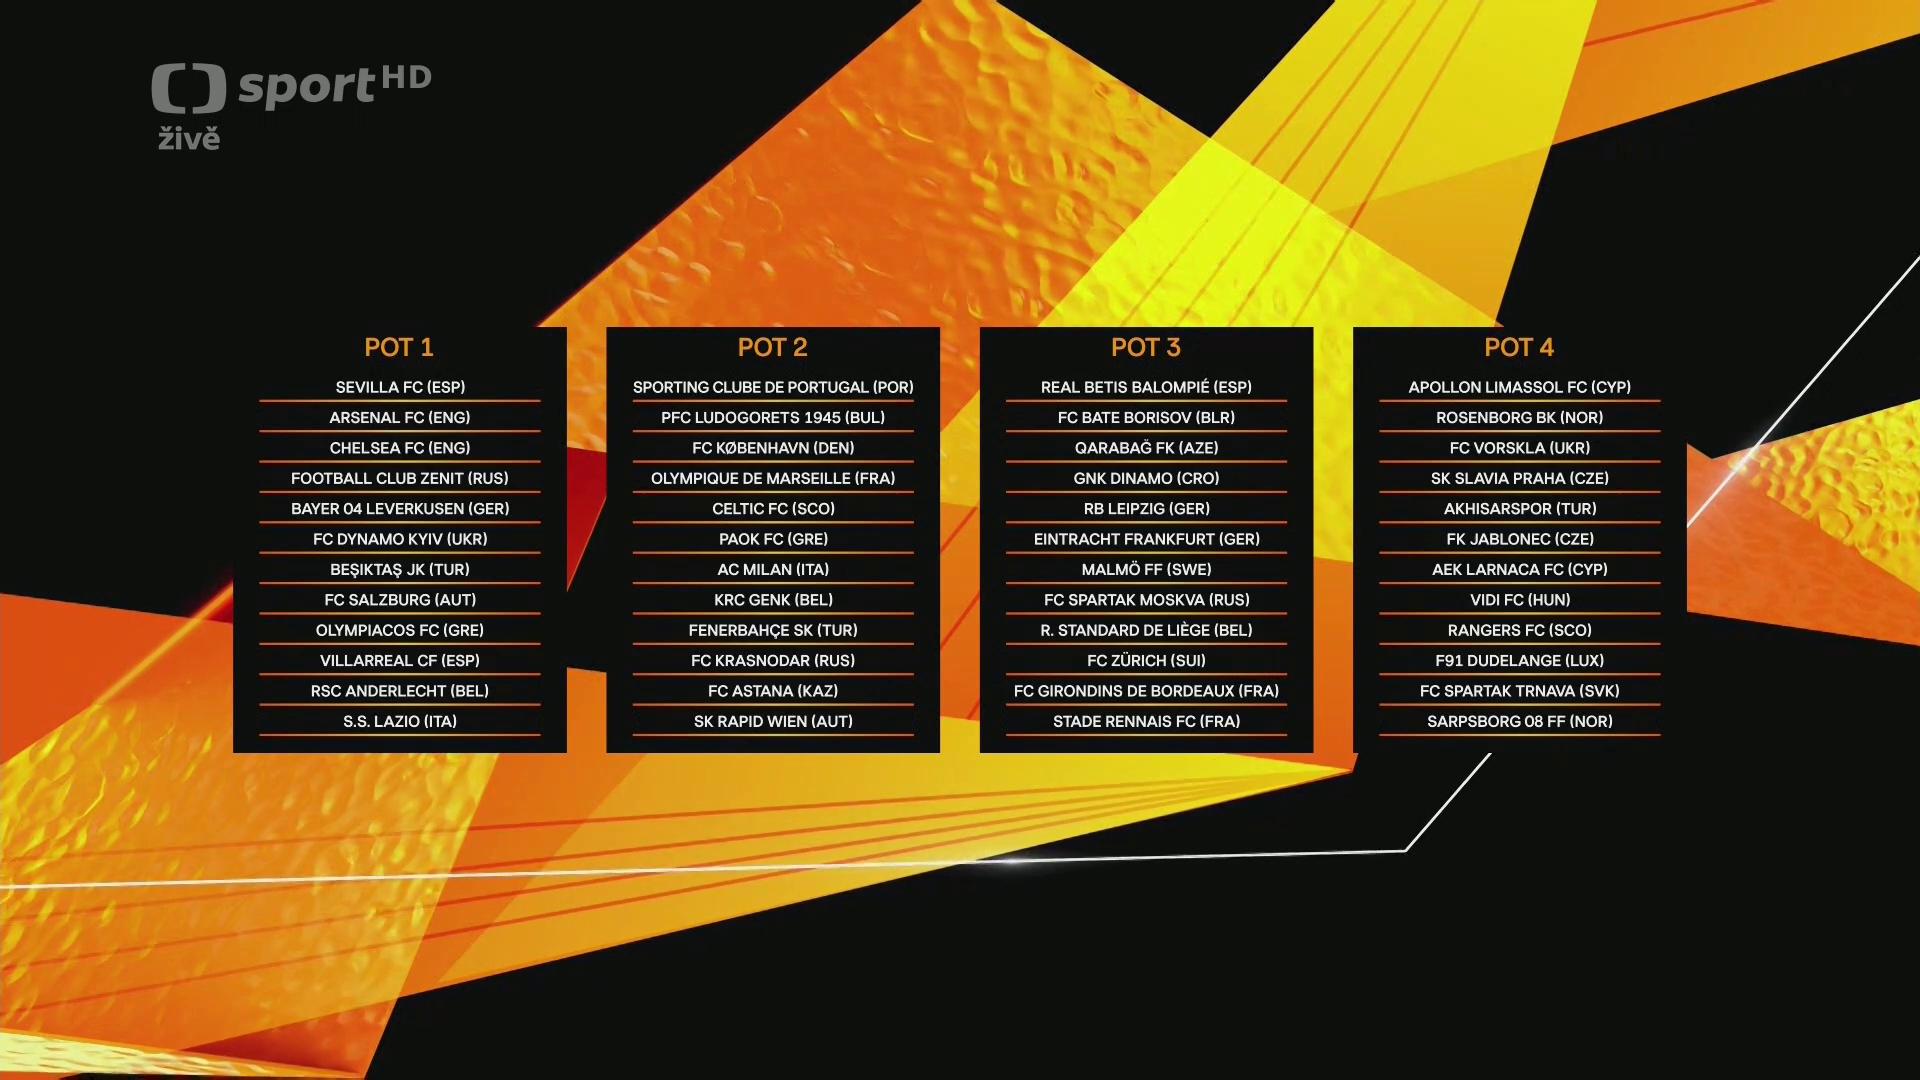 Futbol Uel 2018 19 Uefa Europa League Group Stage Draw 31 08 18